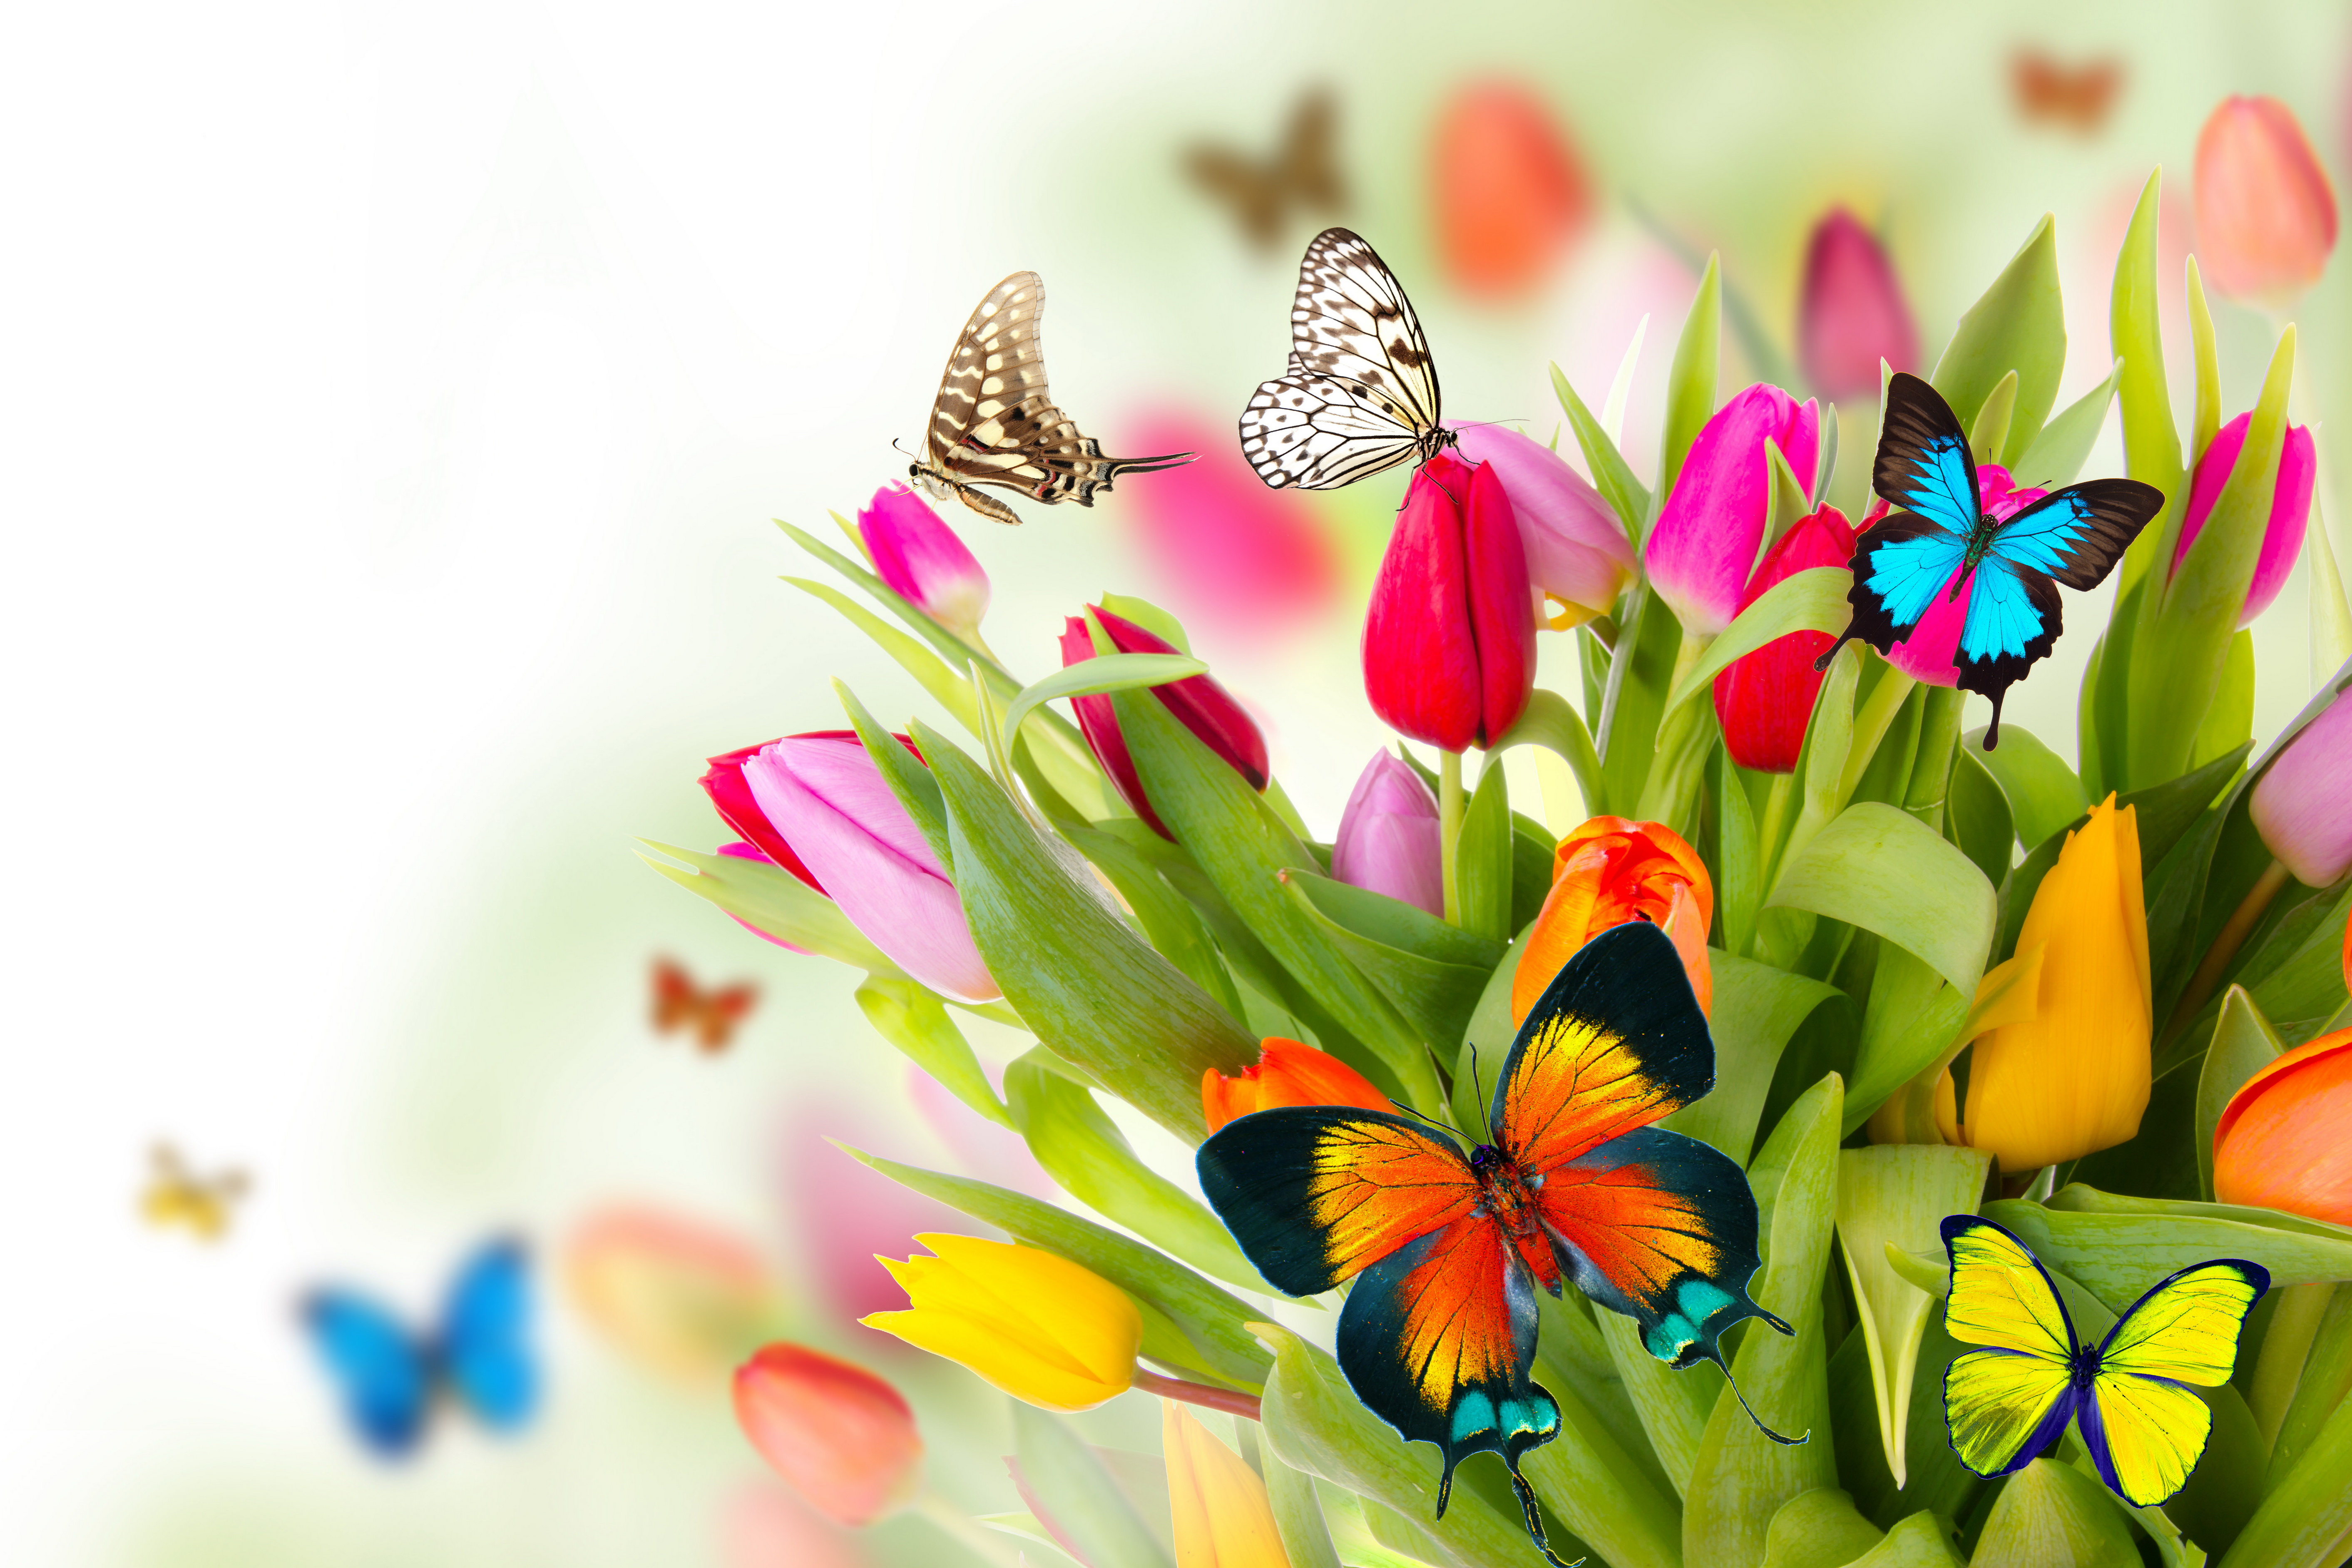 Spring Flowers Desktop Background wallpapers HD   498695 5650x3767